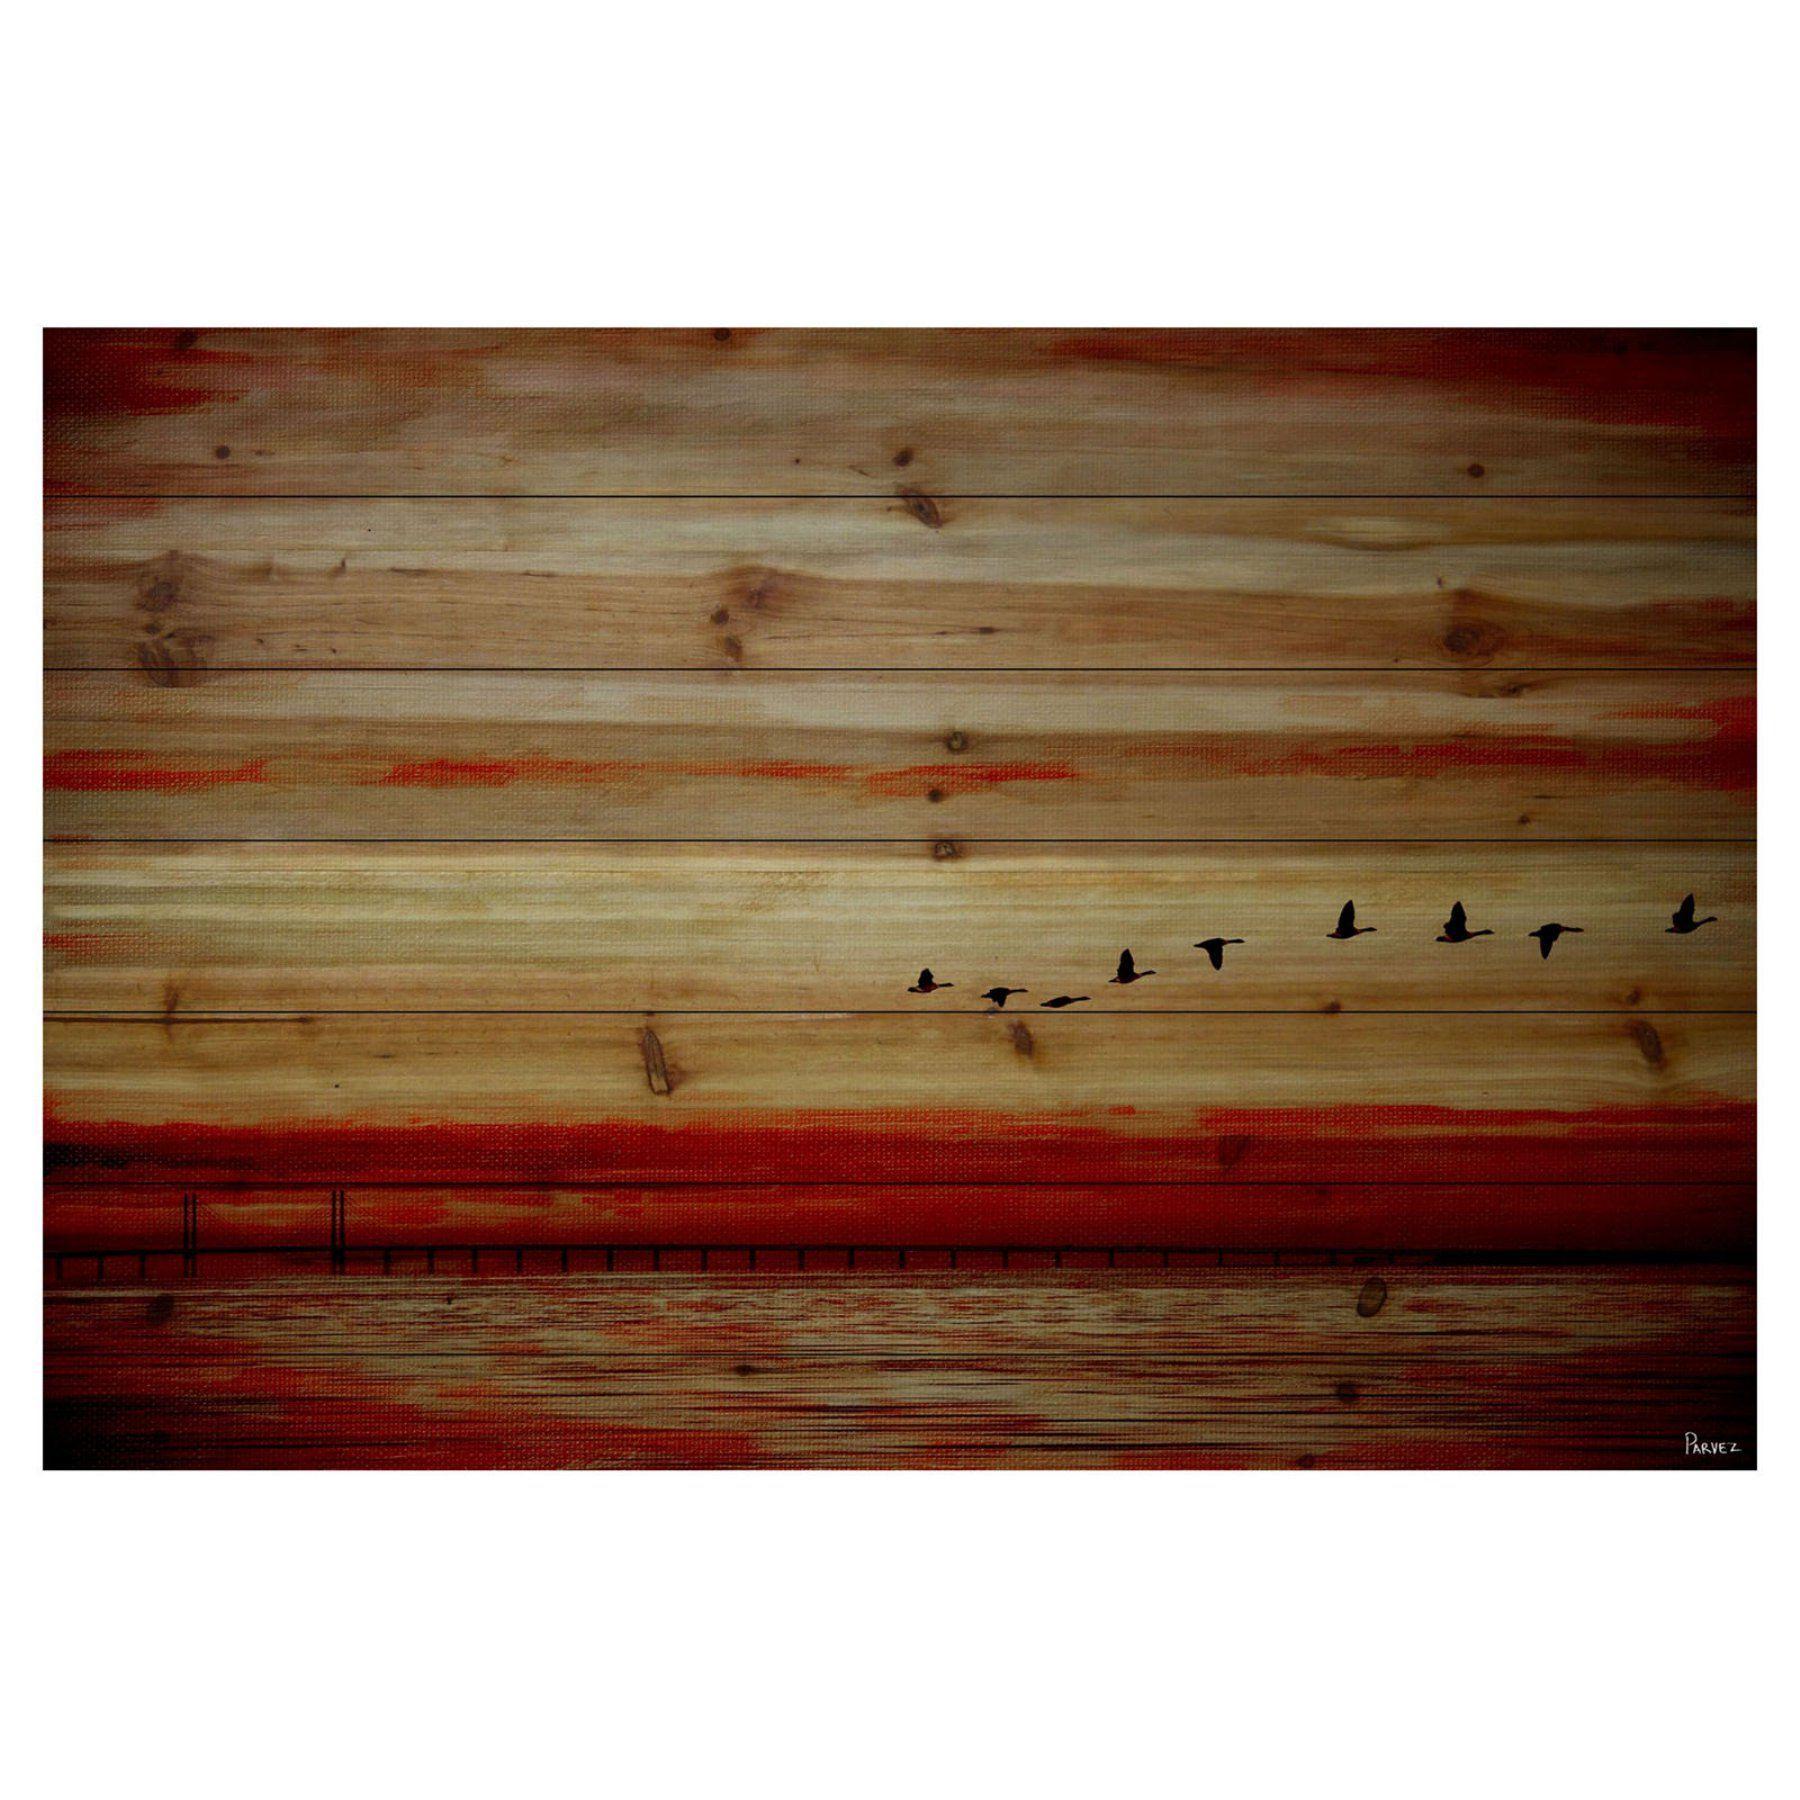 Parvez Taj American Dream Painting Print On Natural Pine: Parvez Taj Flying South Painting Print On Natural Pine